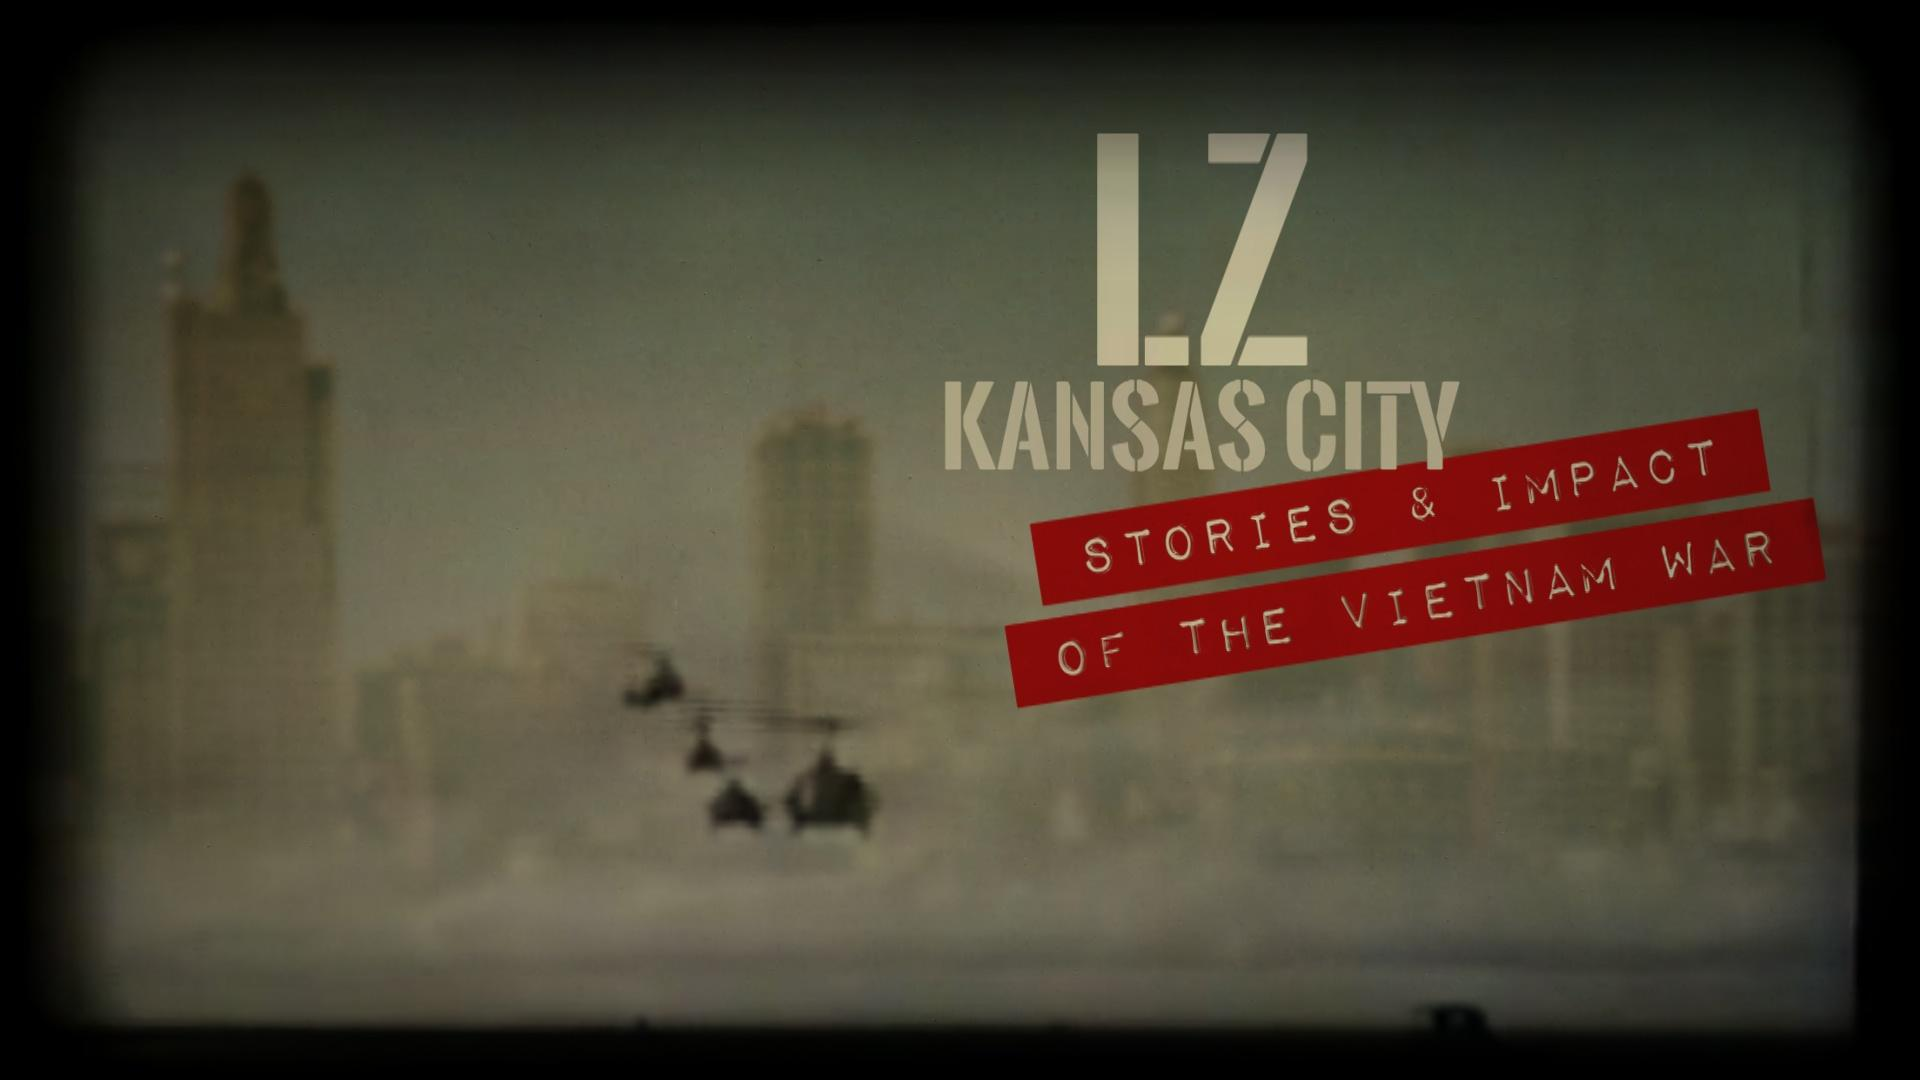 LZ Kansas City